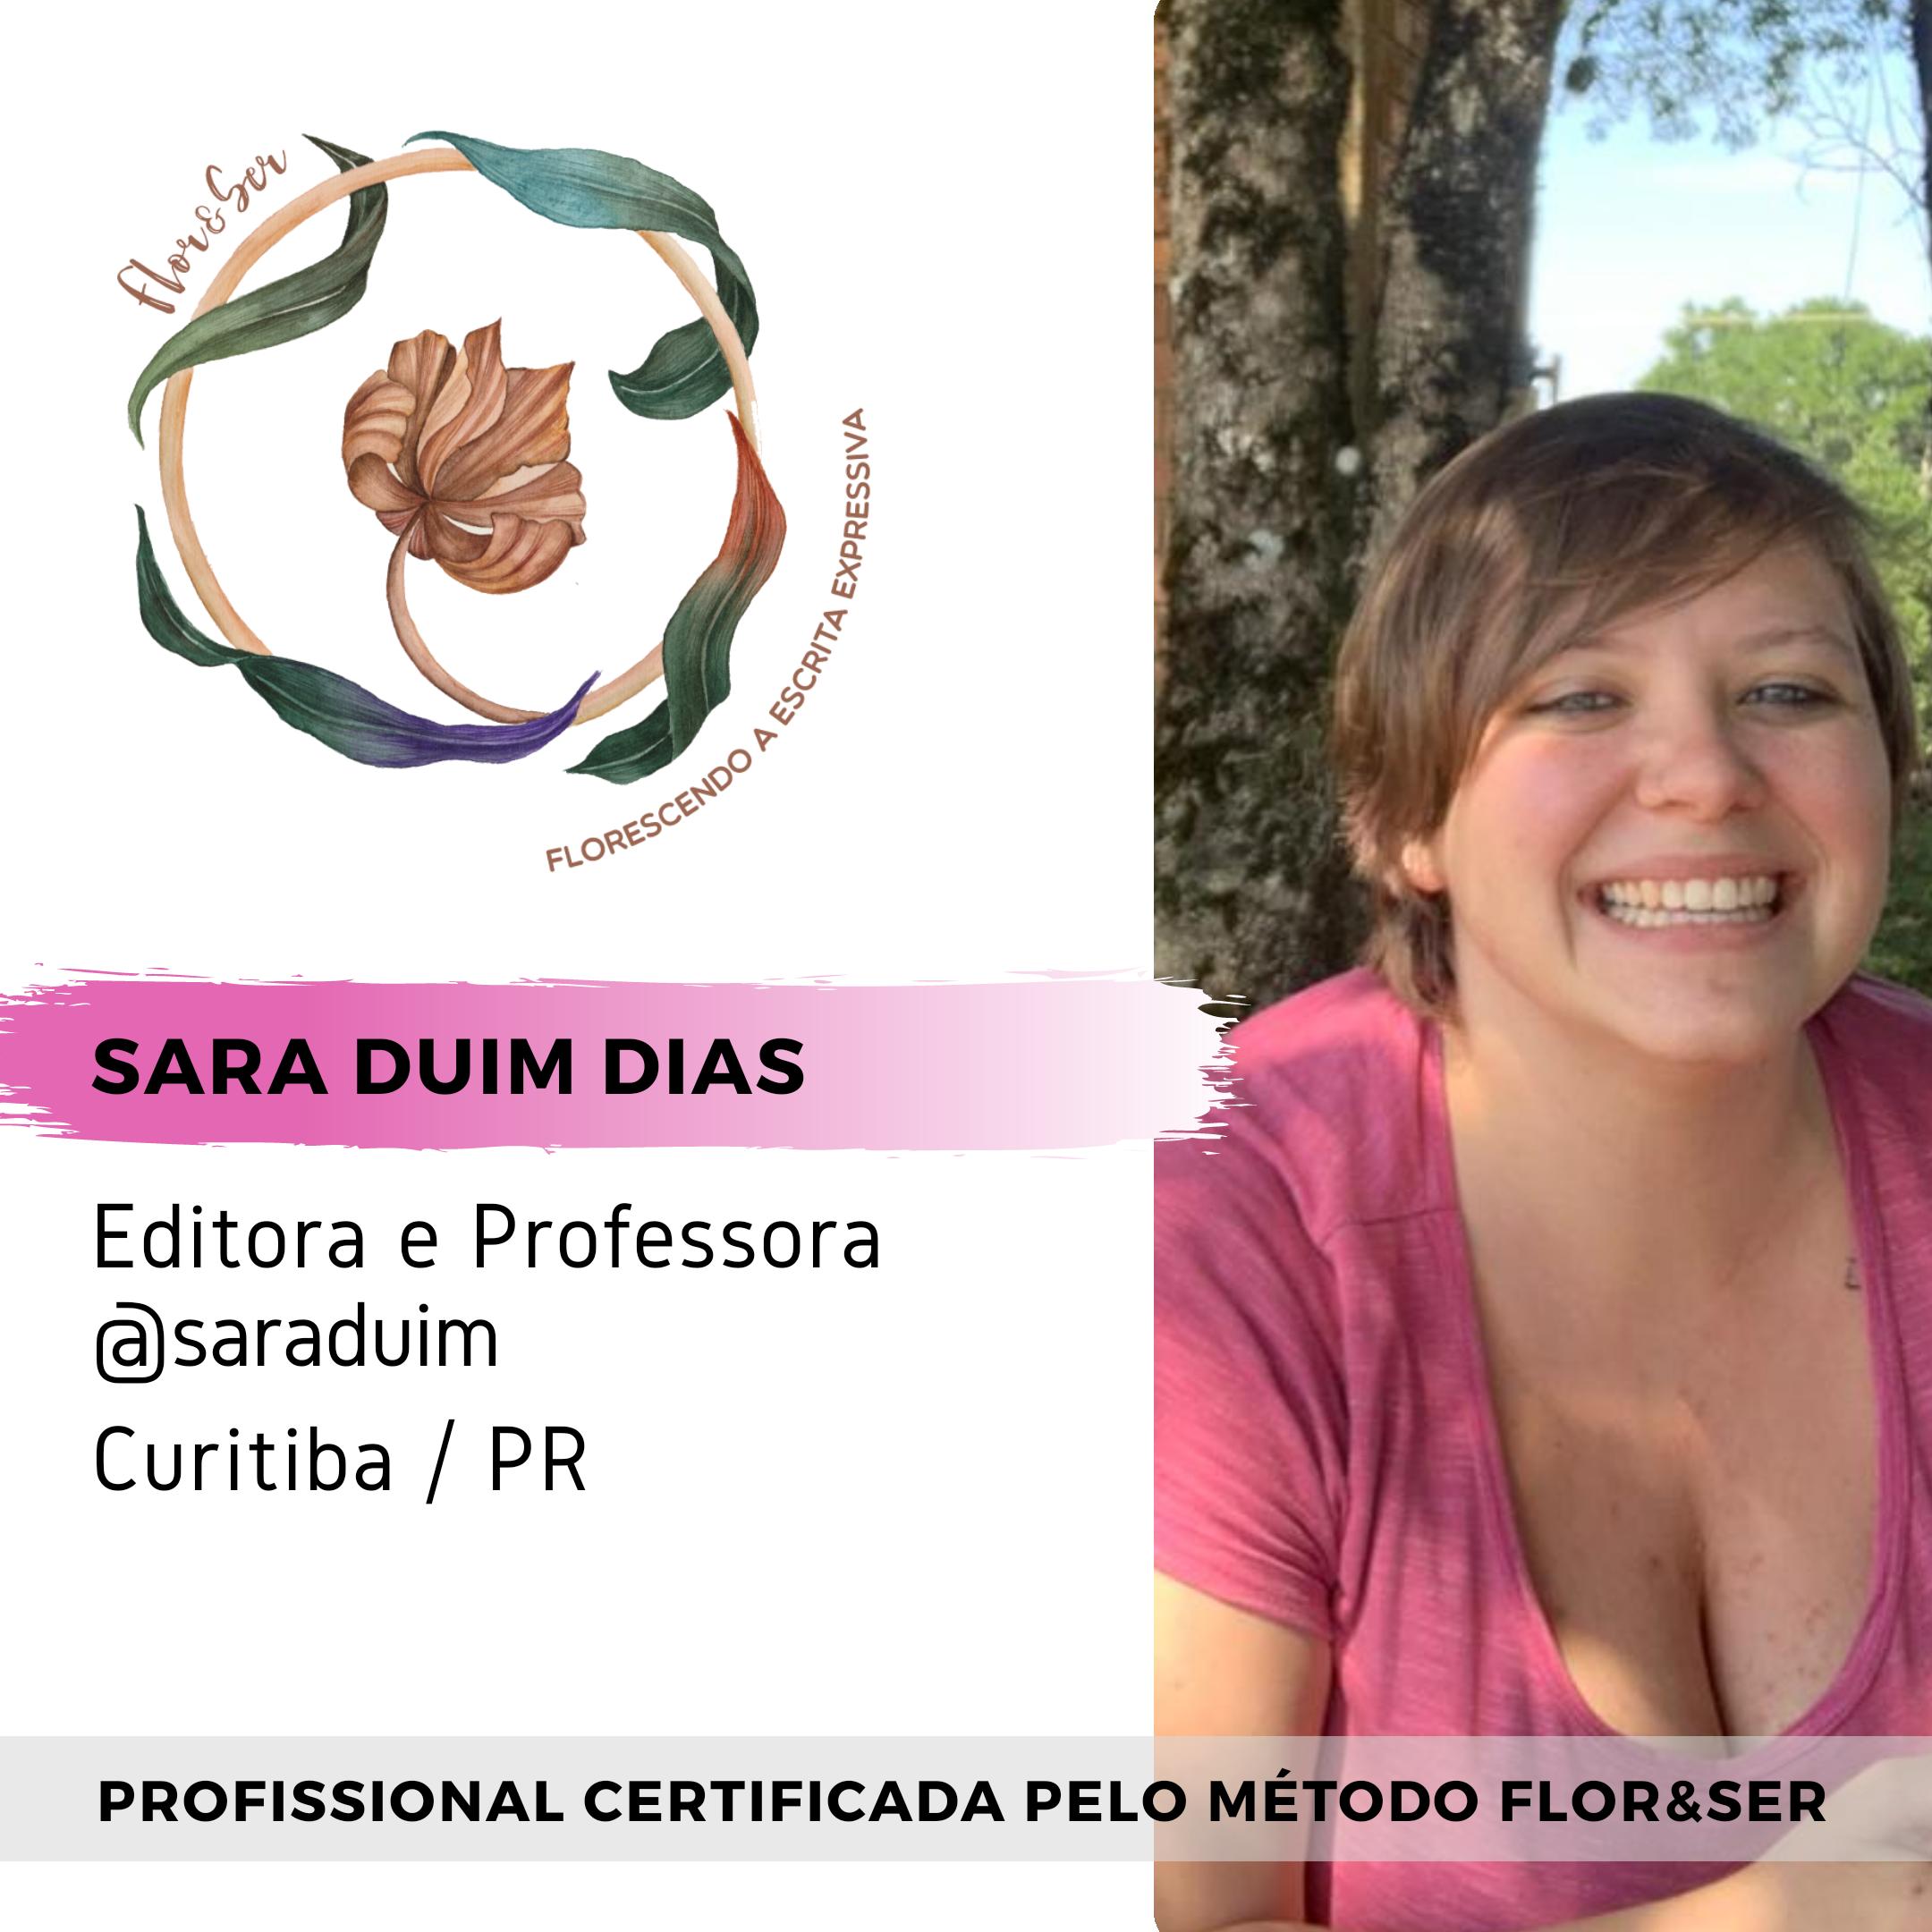 Sara Duim